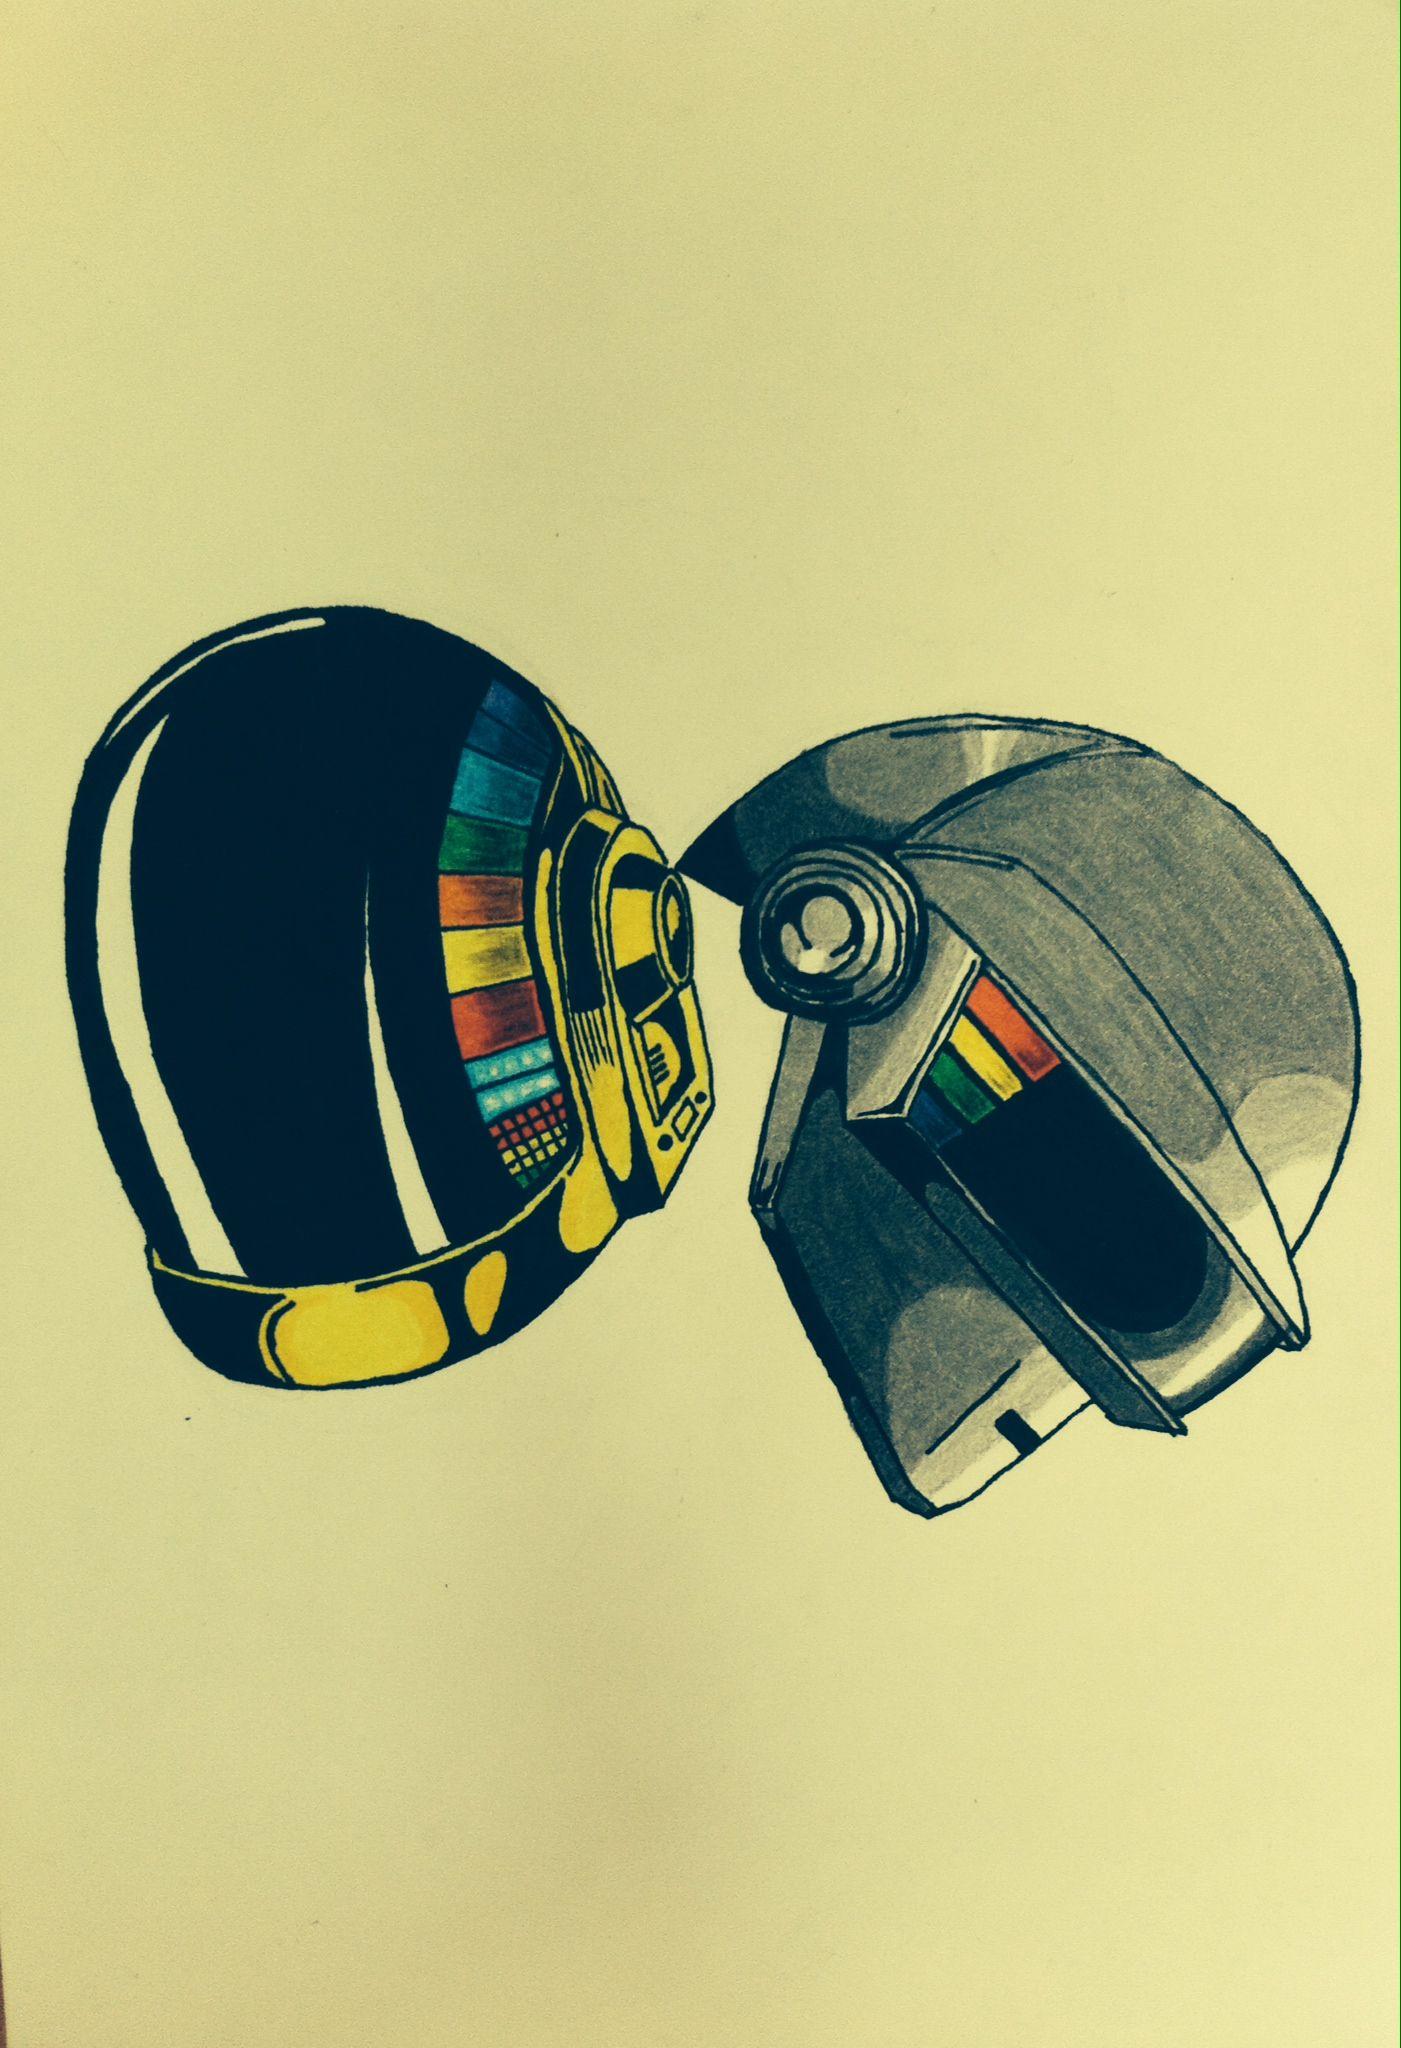 Daft Punk helmets drawing   illustration   Pinterest   Daft punk and ...